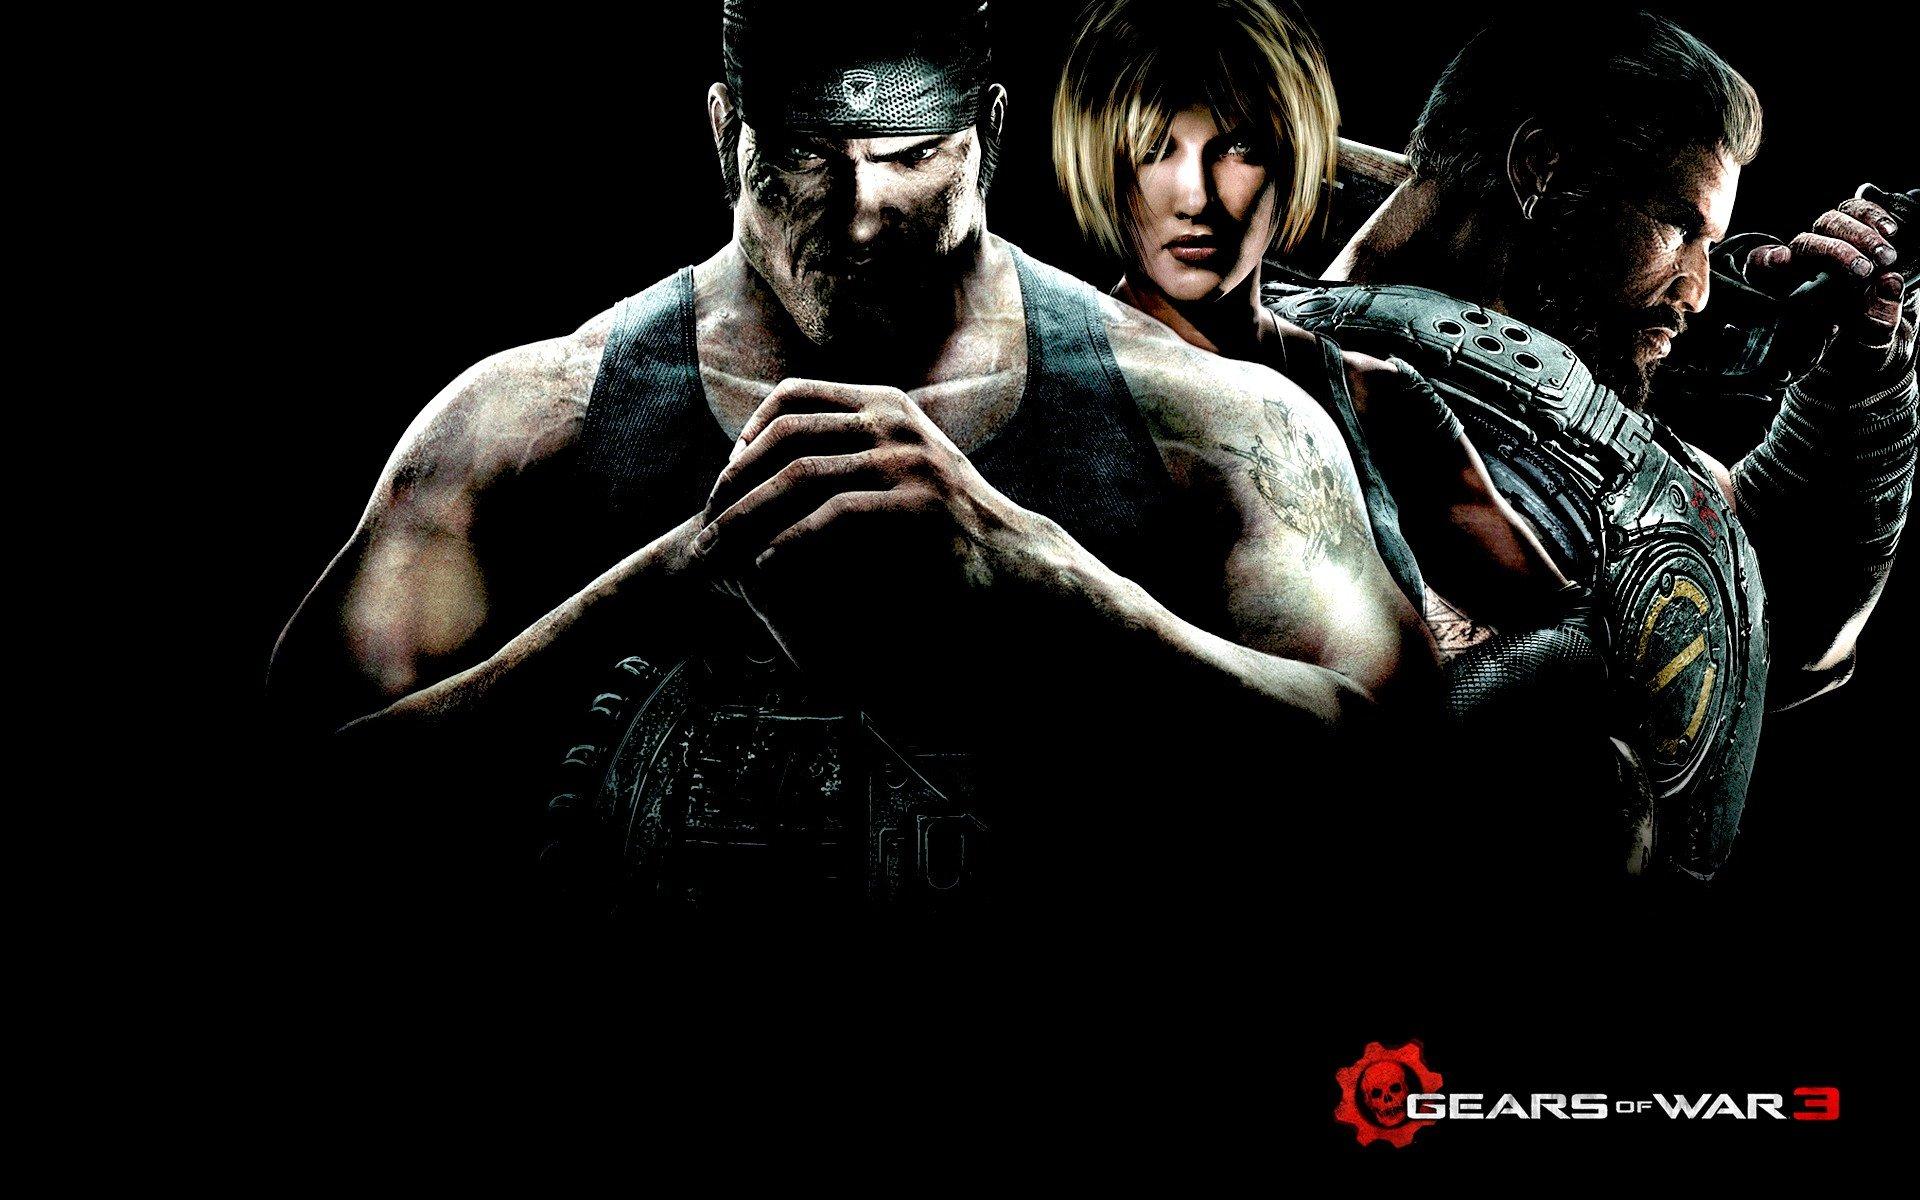 Gears Of War 3 Hd Wallpapers For Ipad: Gears Of War HD Wallpapers / Desktop And Mobile Images